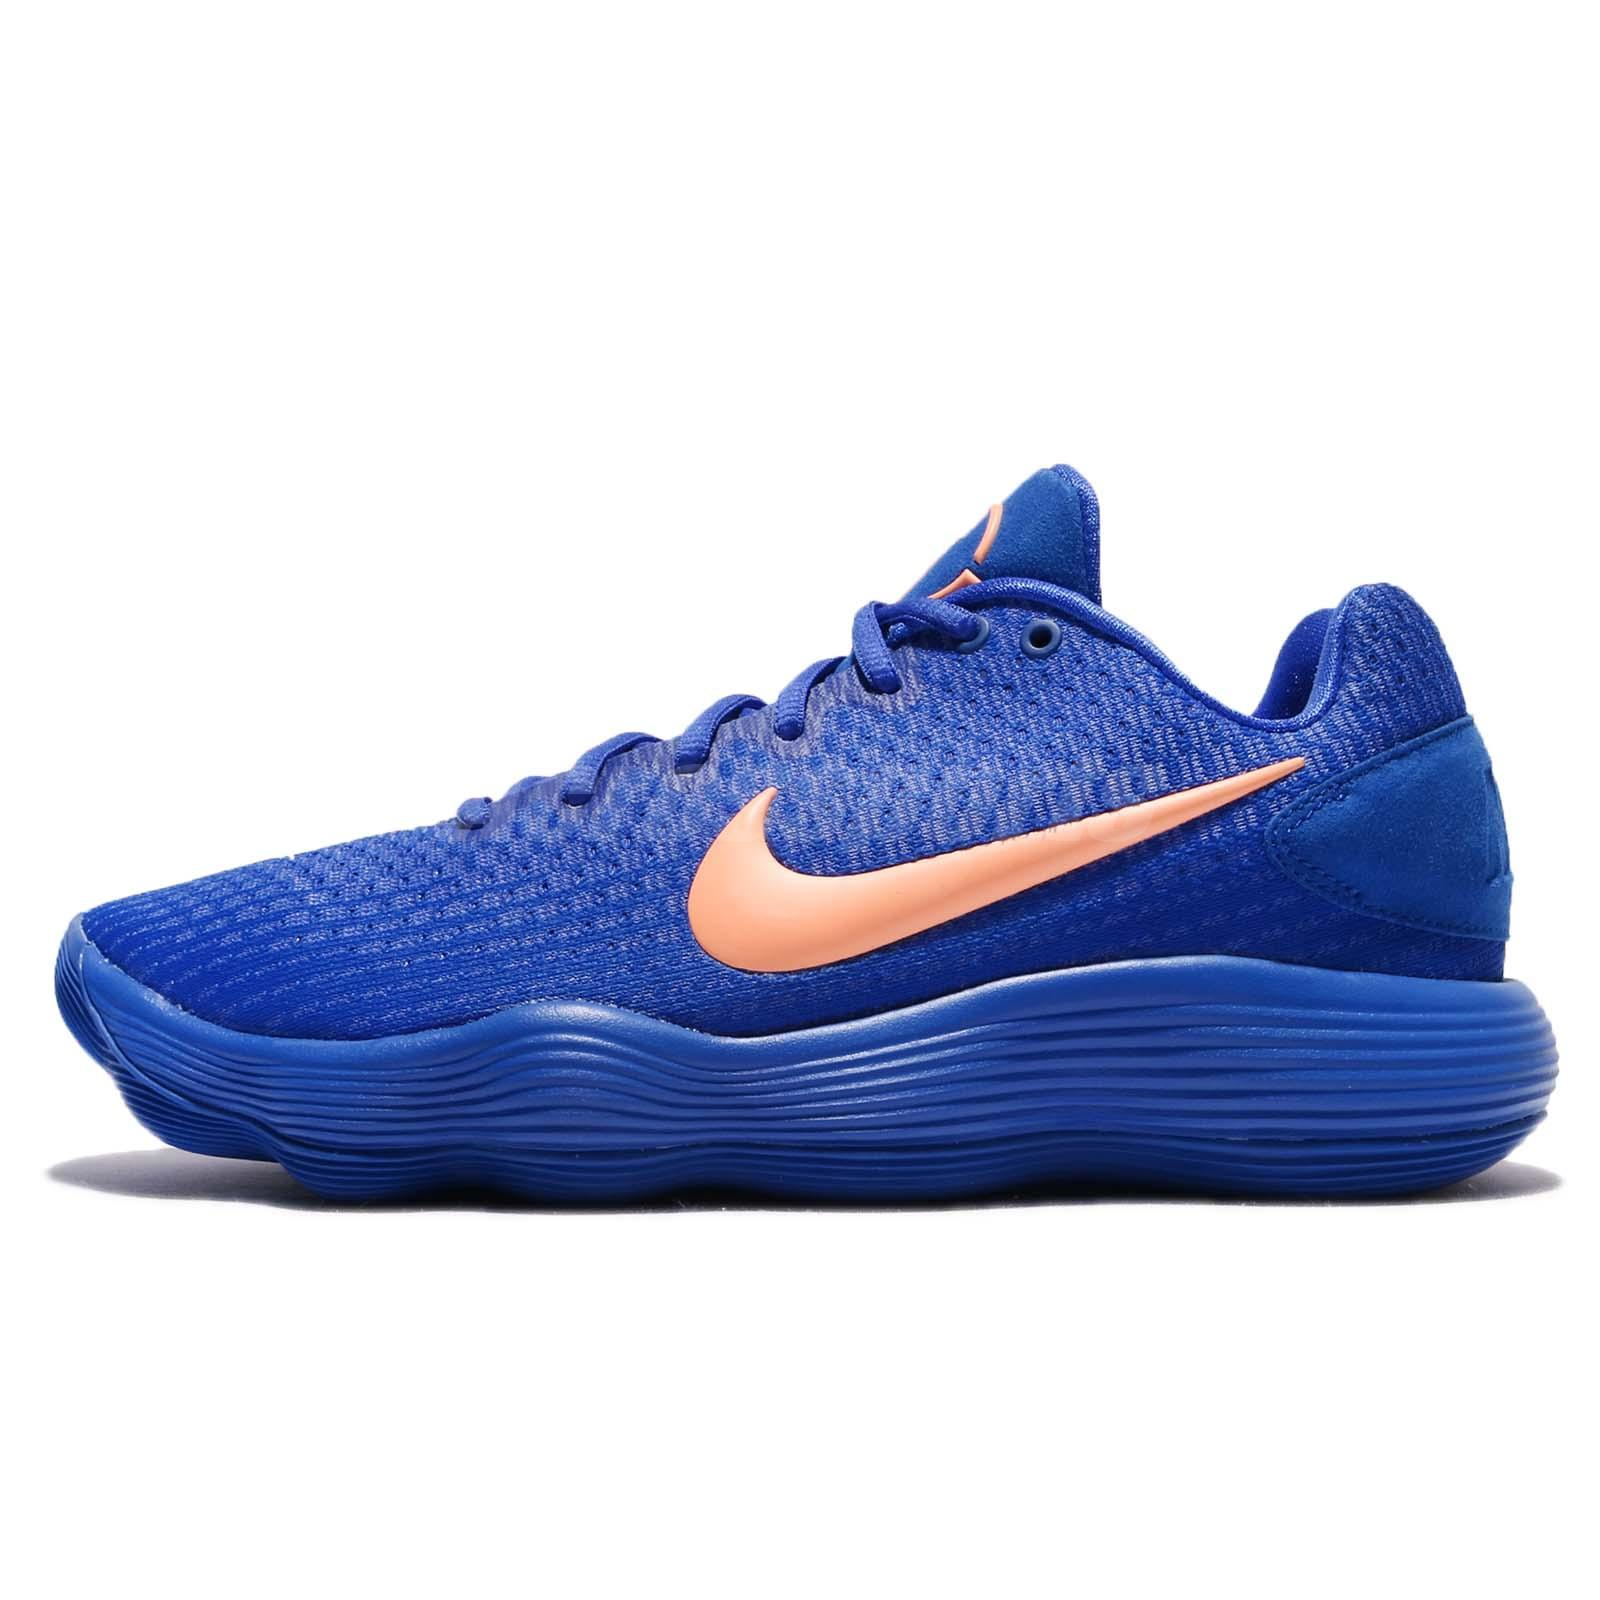 cbf93cfd1bf ... ireland nike hyperdunk 2017 low ep racer blue orange men basketball  shoes 897637 401 21dd0 9d8dd ...